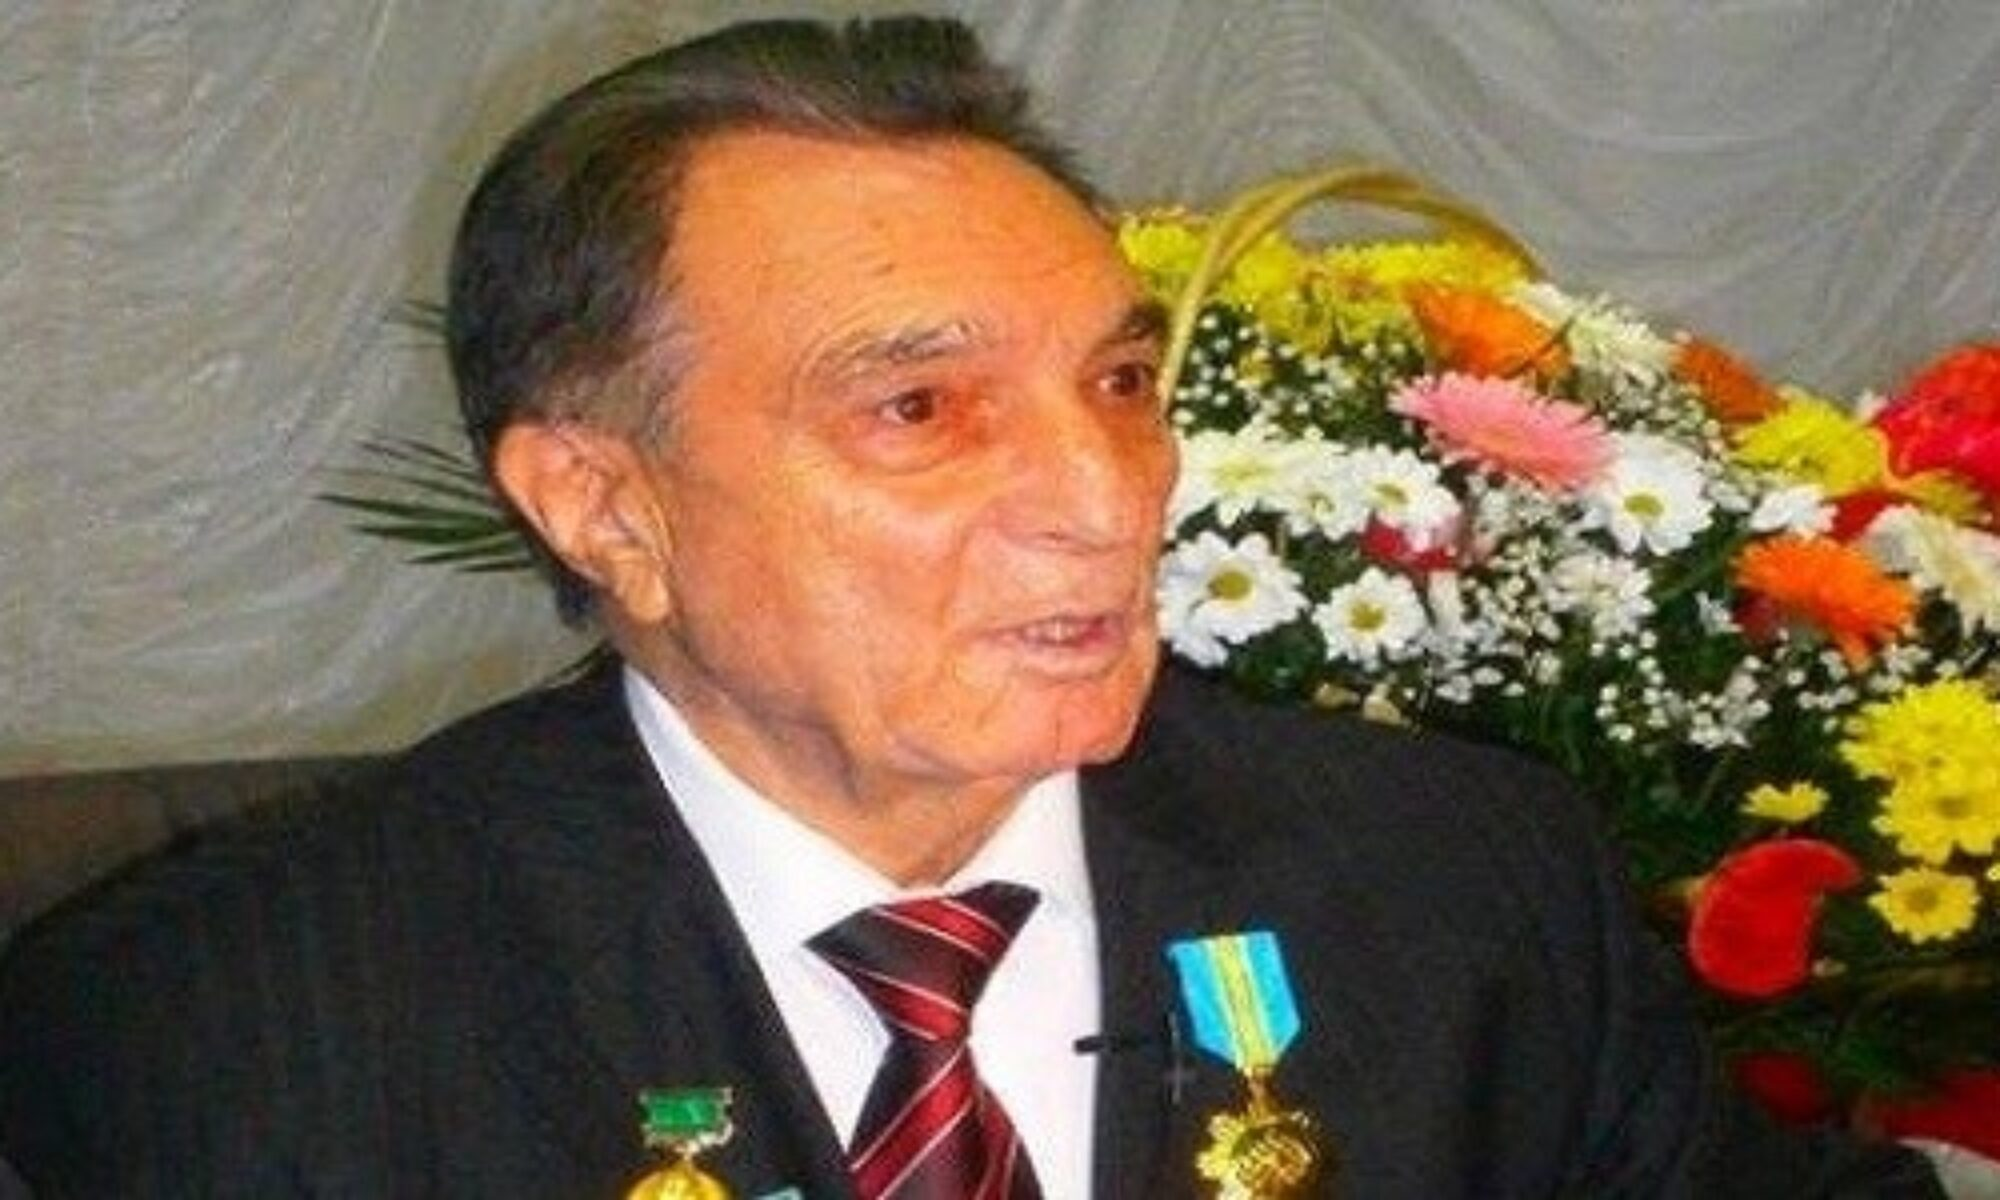 Dünya çapında tanınan Kürt Profesör Nadir Nadirov hayatını kaybetti